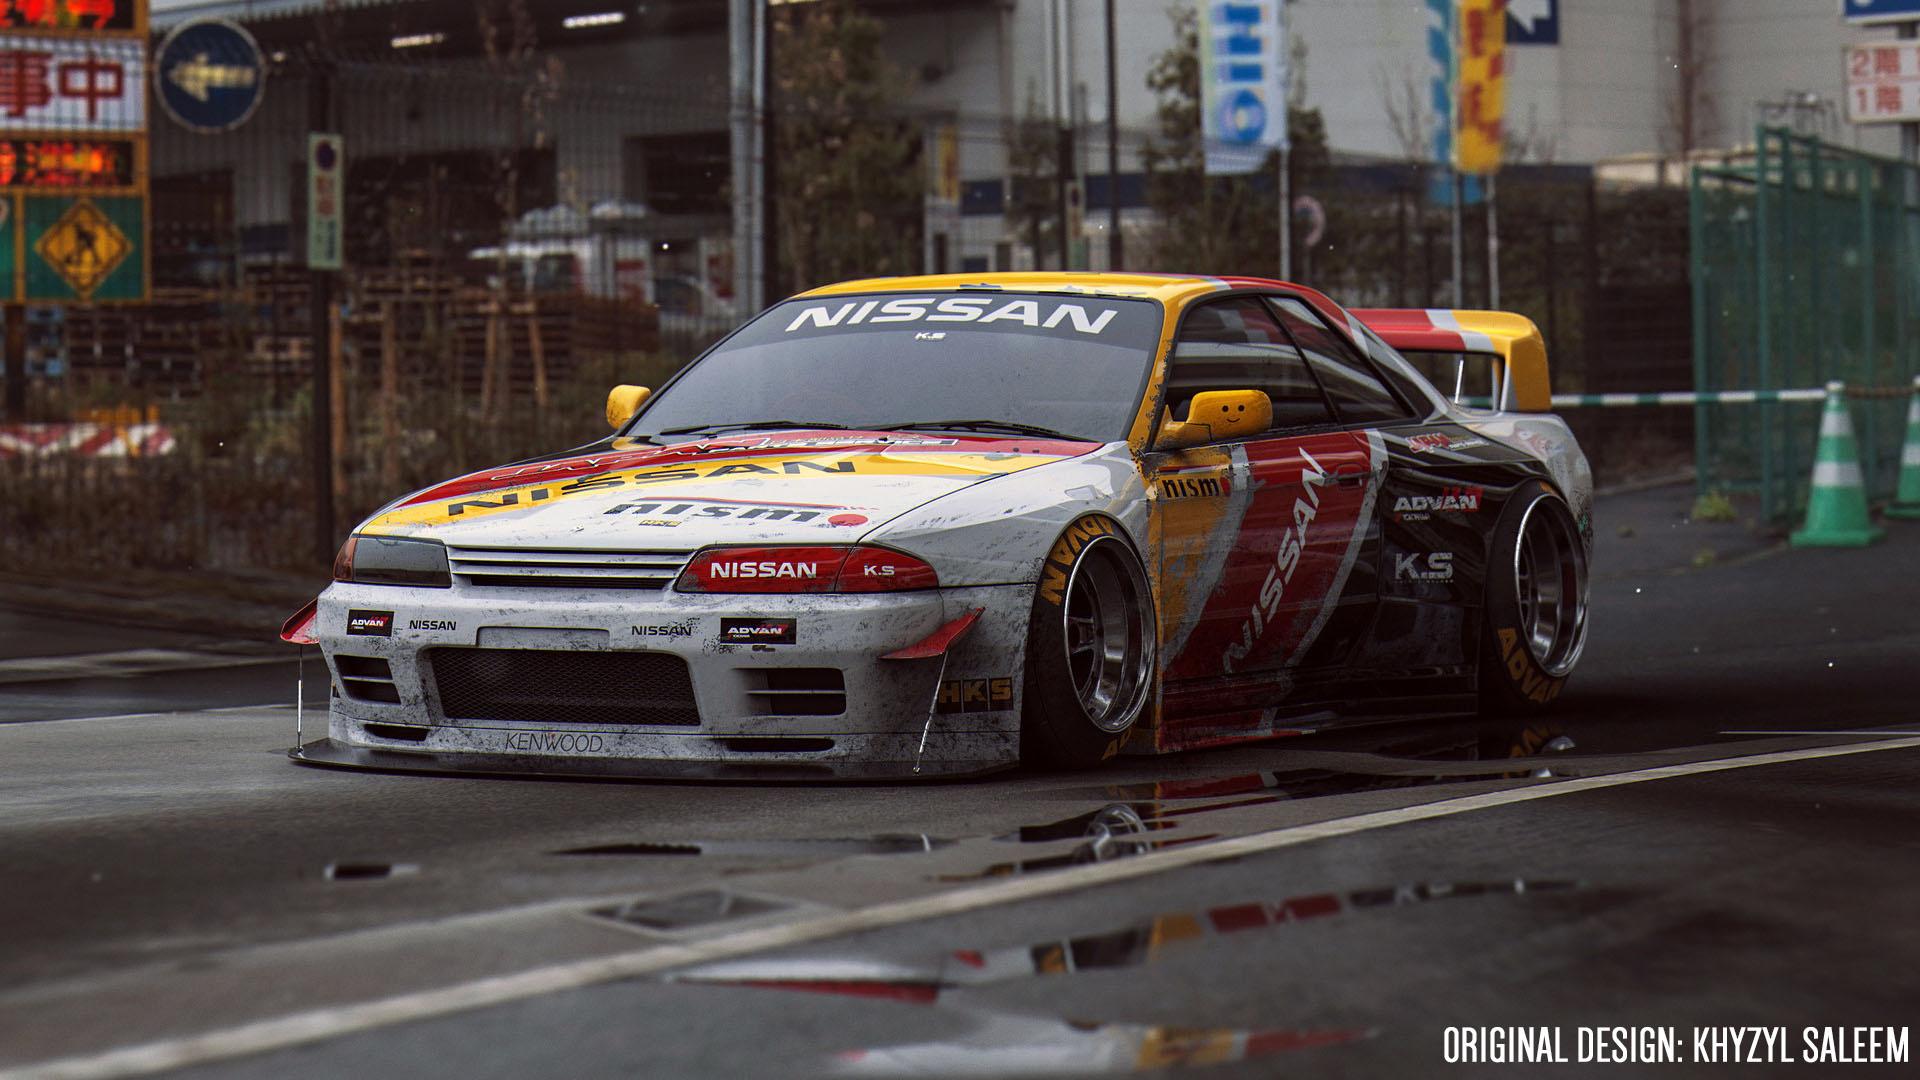 nissan skyline gt-r(bnr32) nismo racing/rally livery - gta5-mods